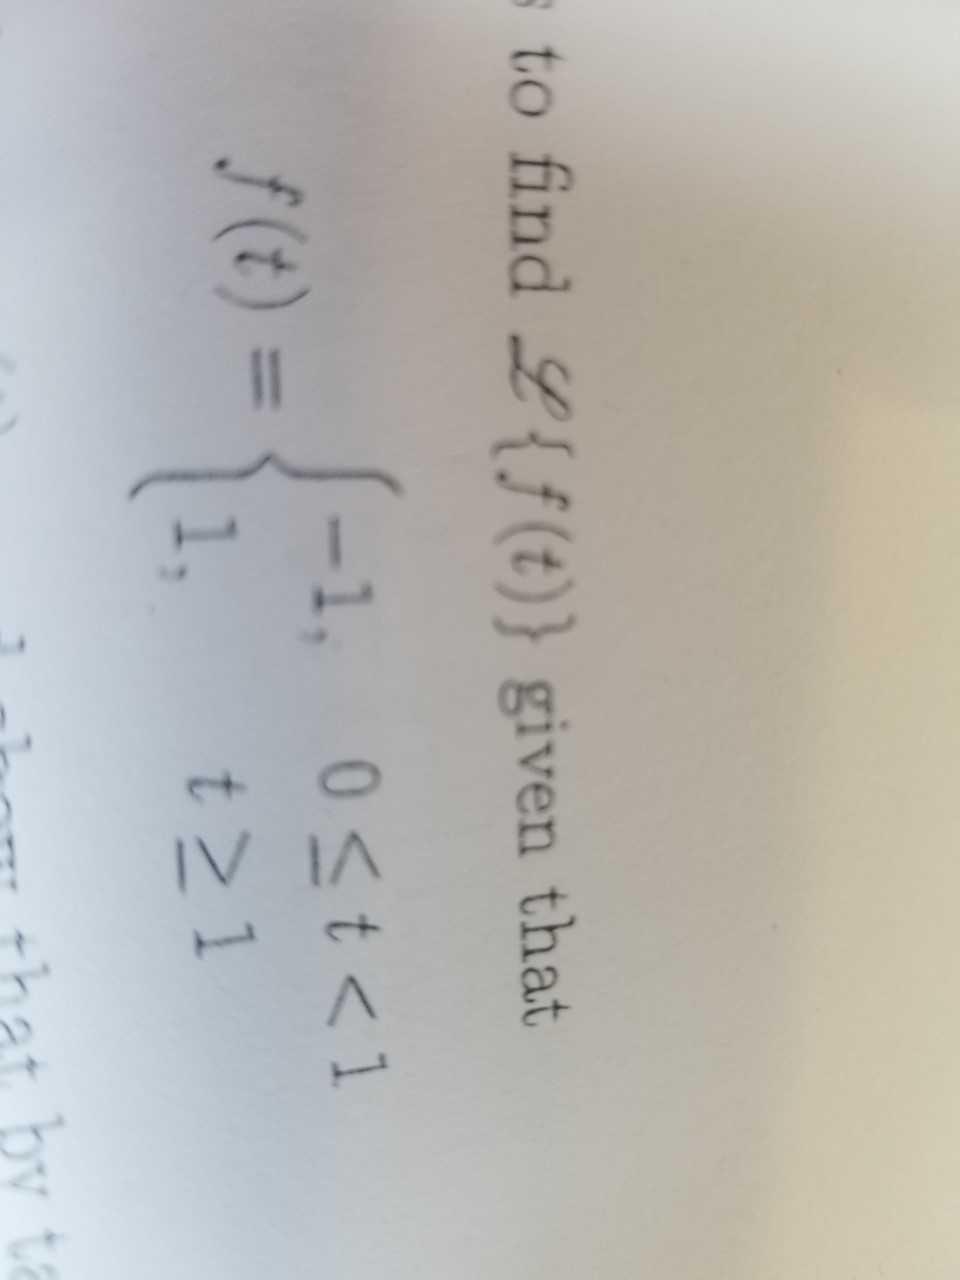 s to find {f(t)} given that -1, 0<t<1 f(t) = t21 by ta